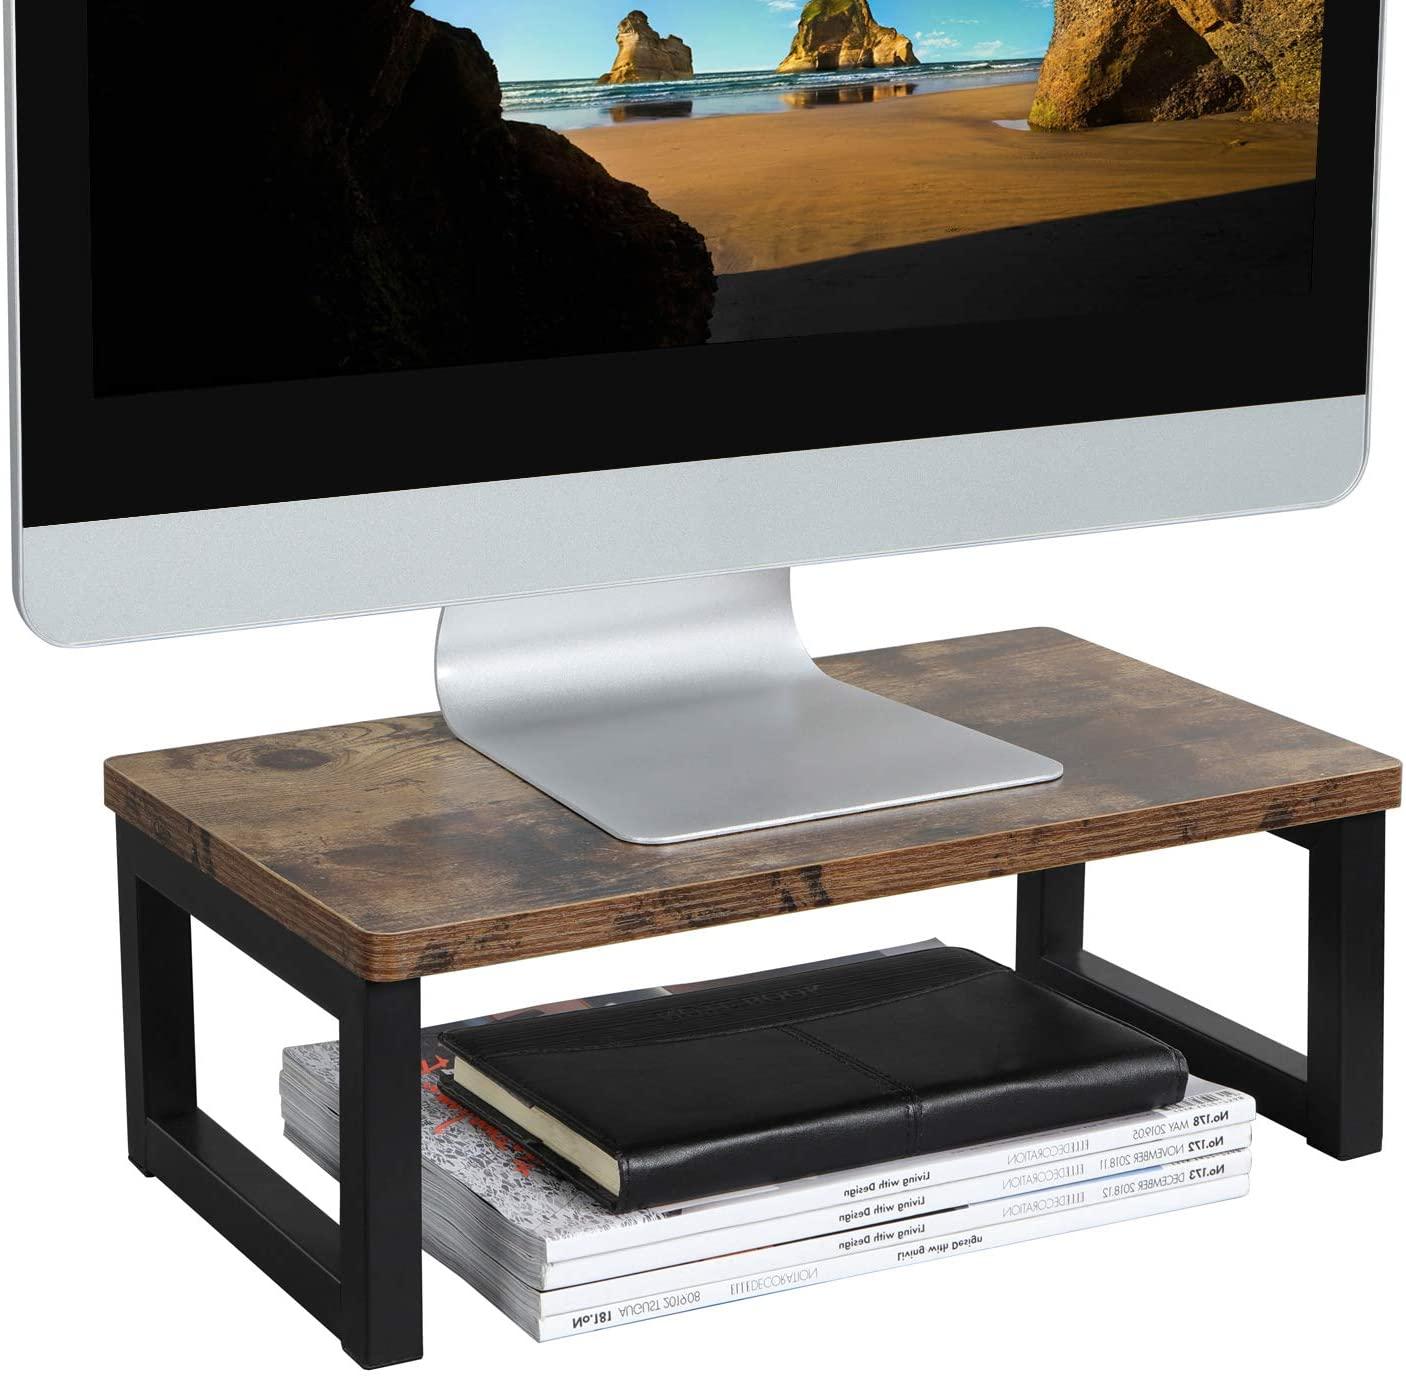 OROPY Vintage Wood Monitor Stand Riser